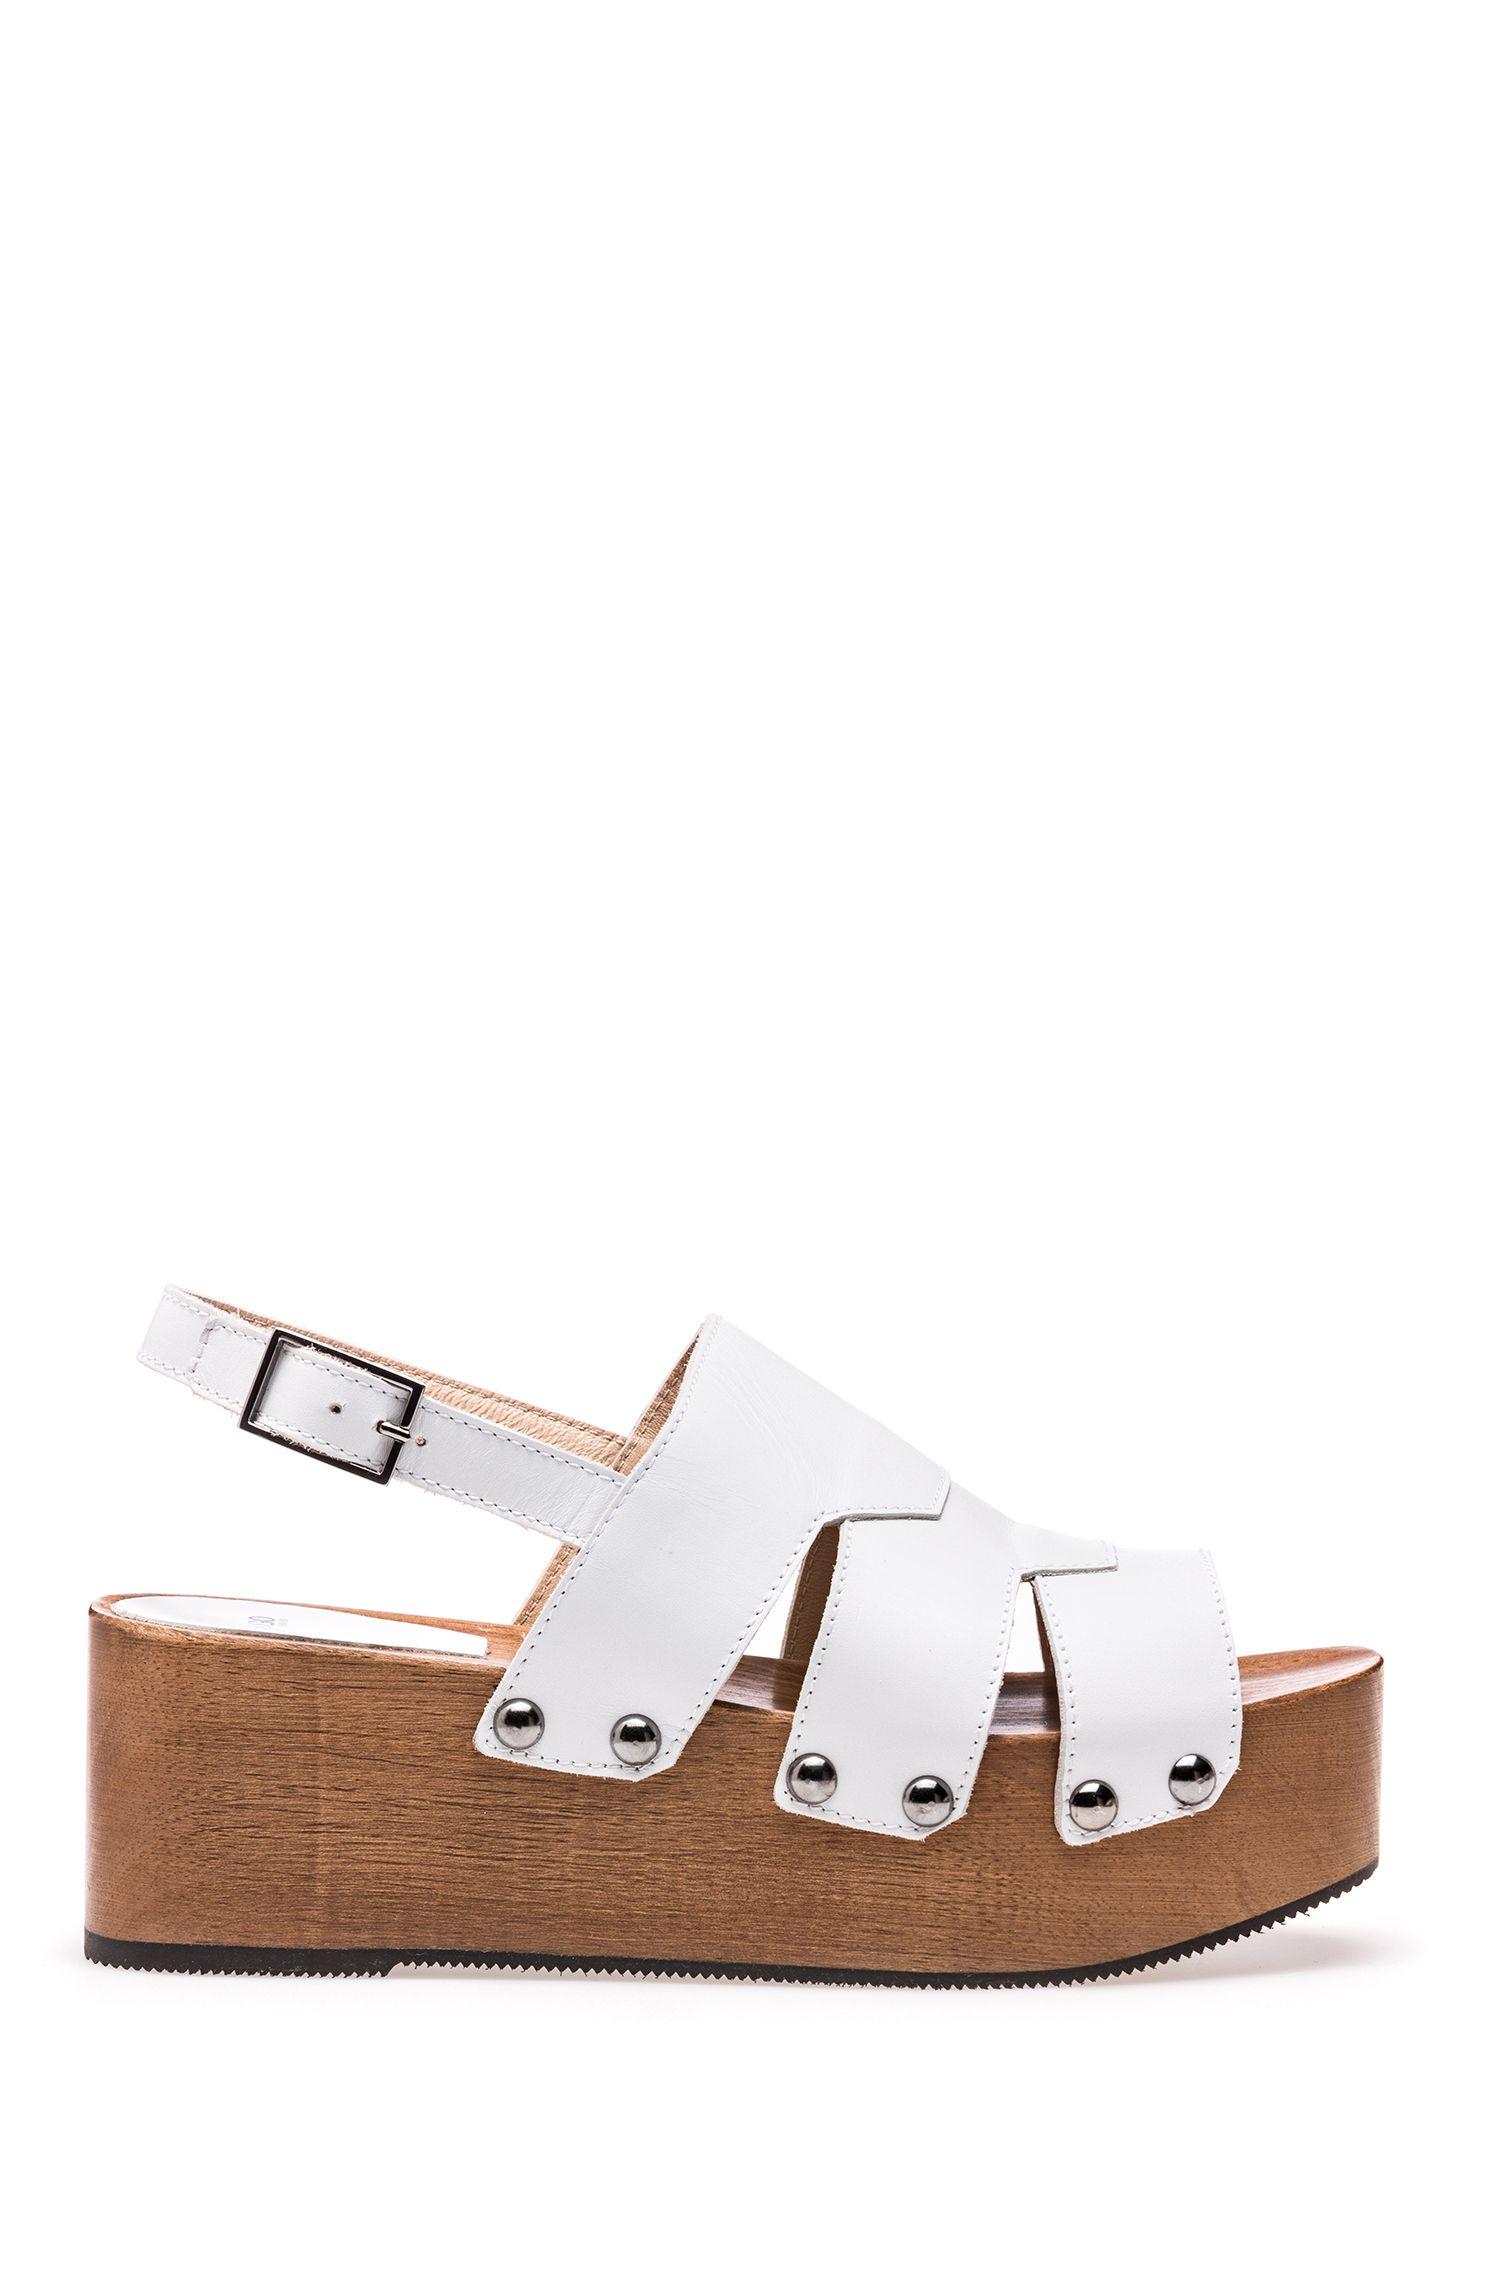 Leather platform sandals with stud detailing